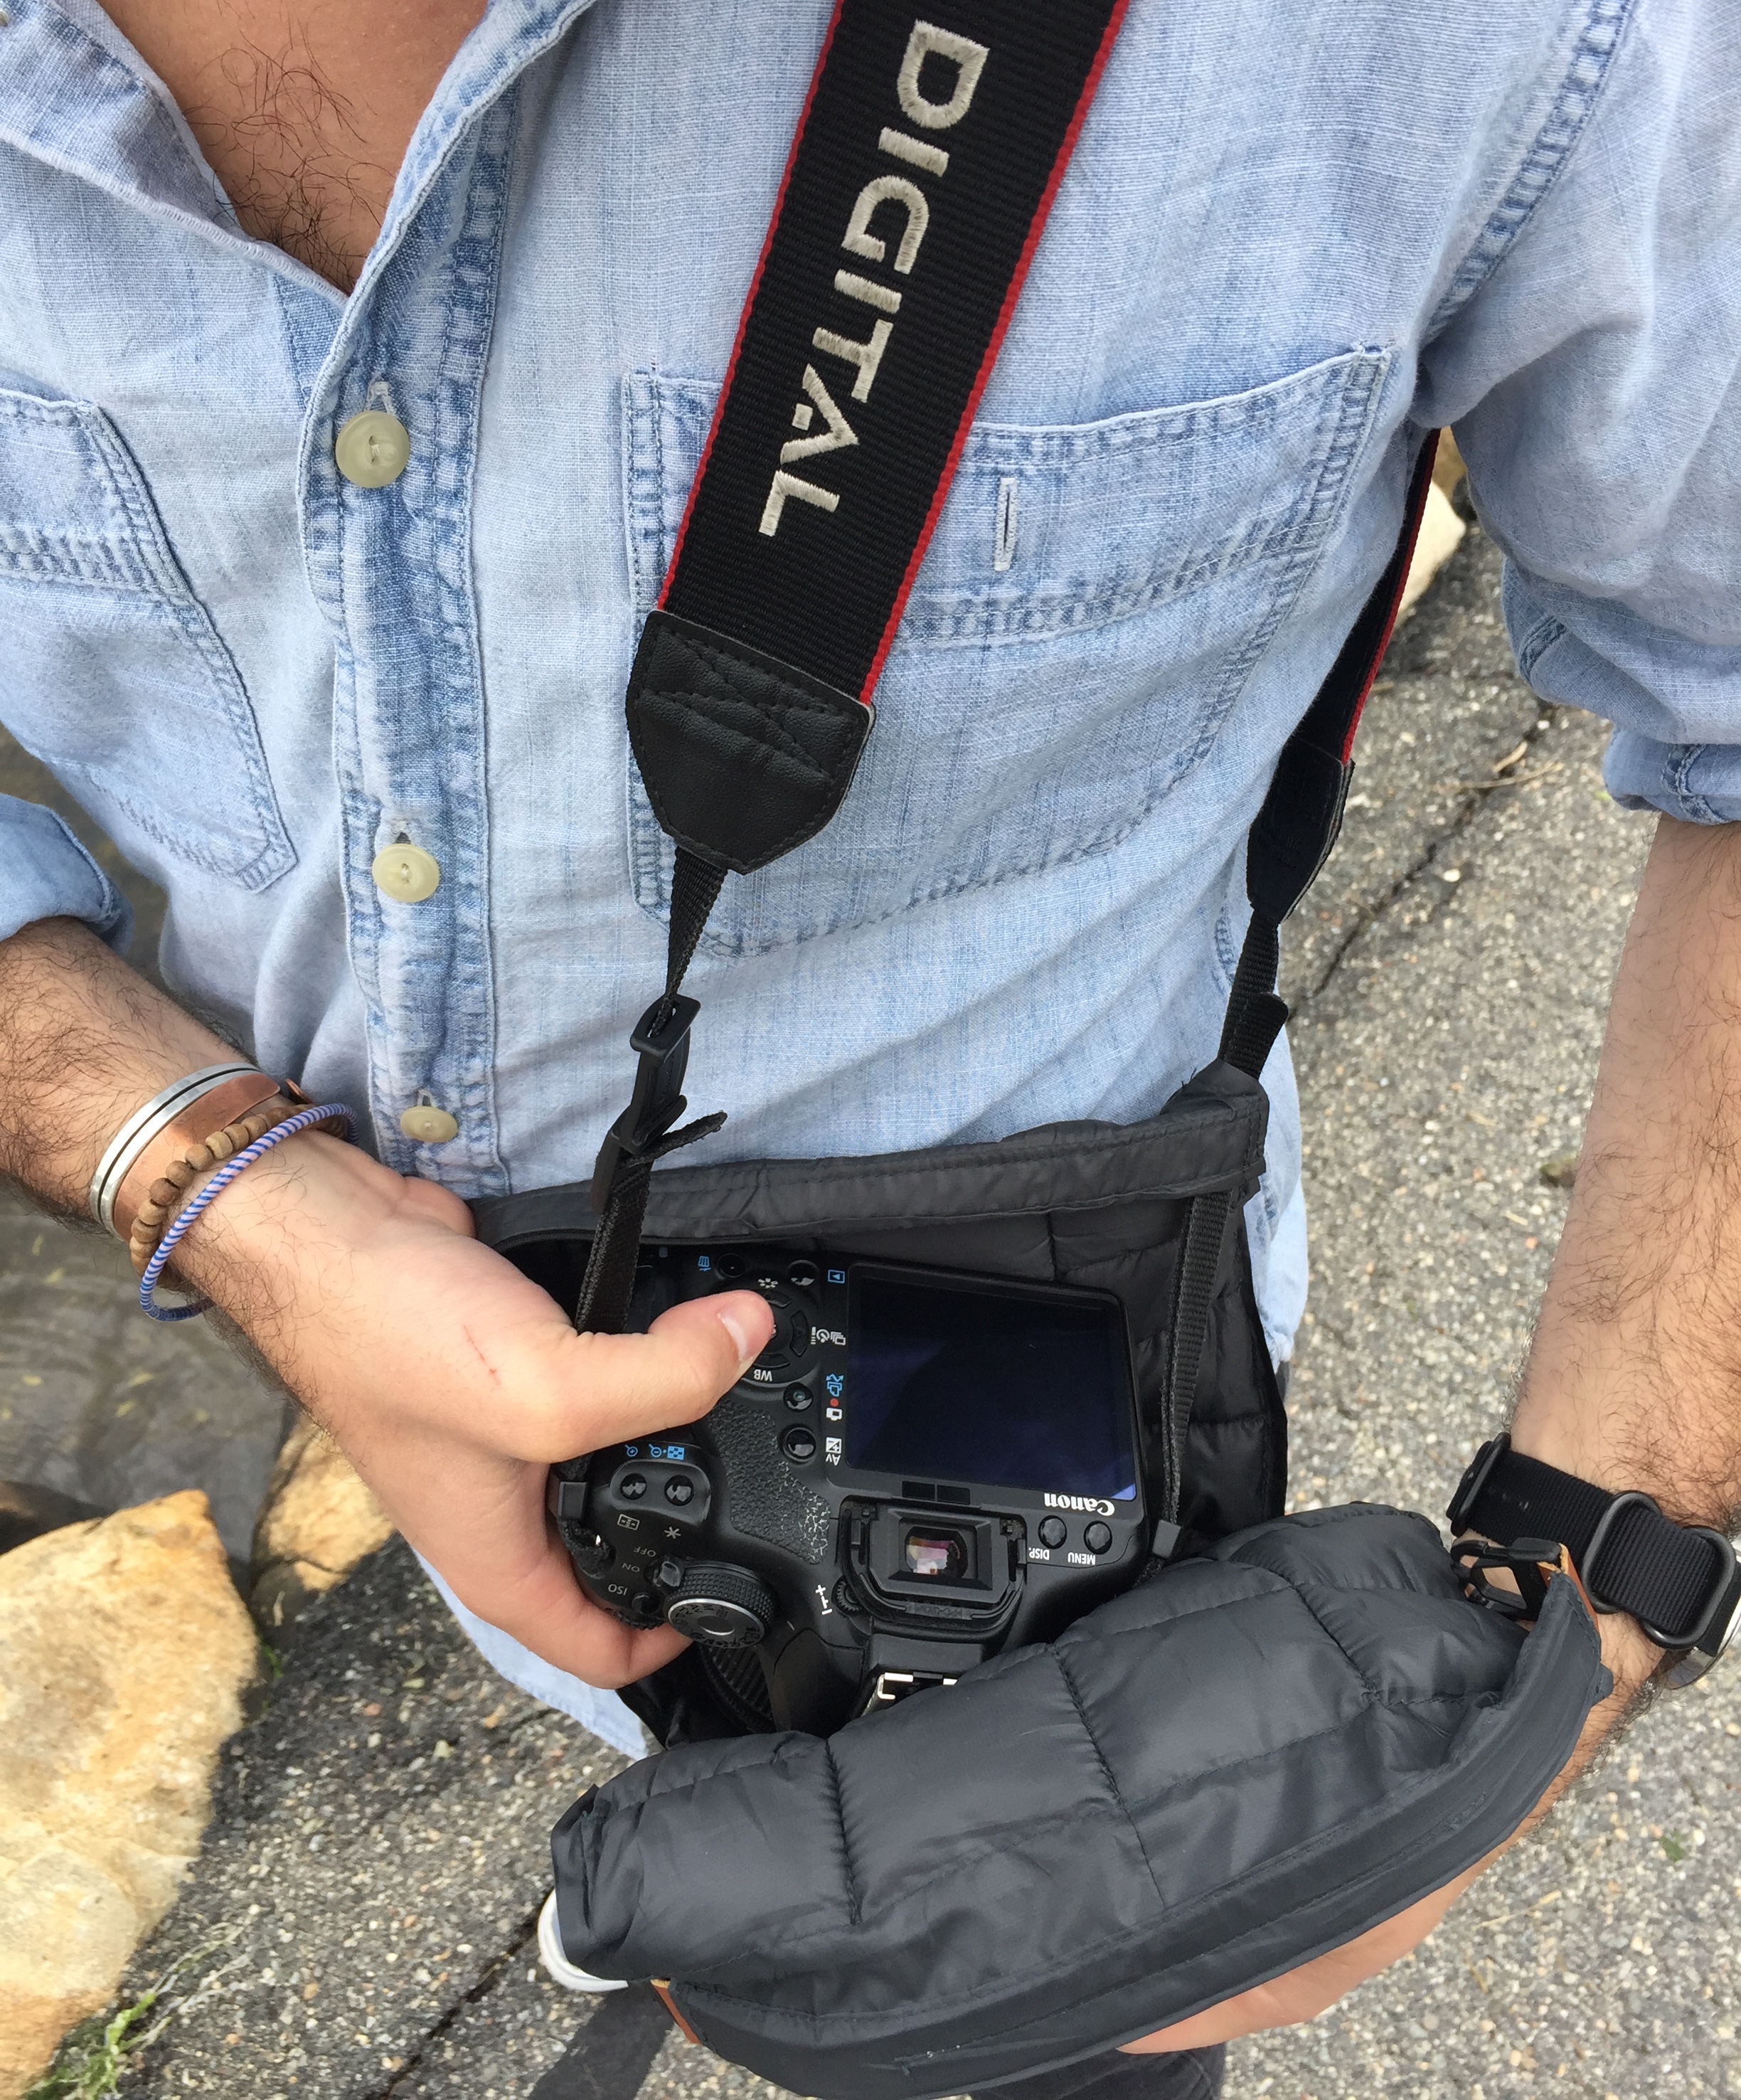 Matador Camera Base Layer: $59.99